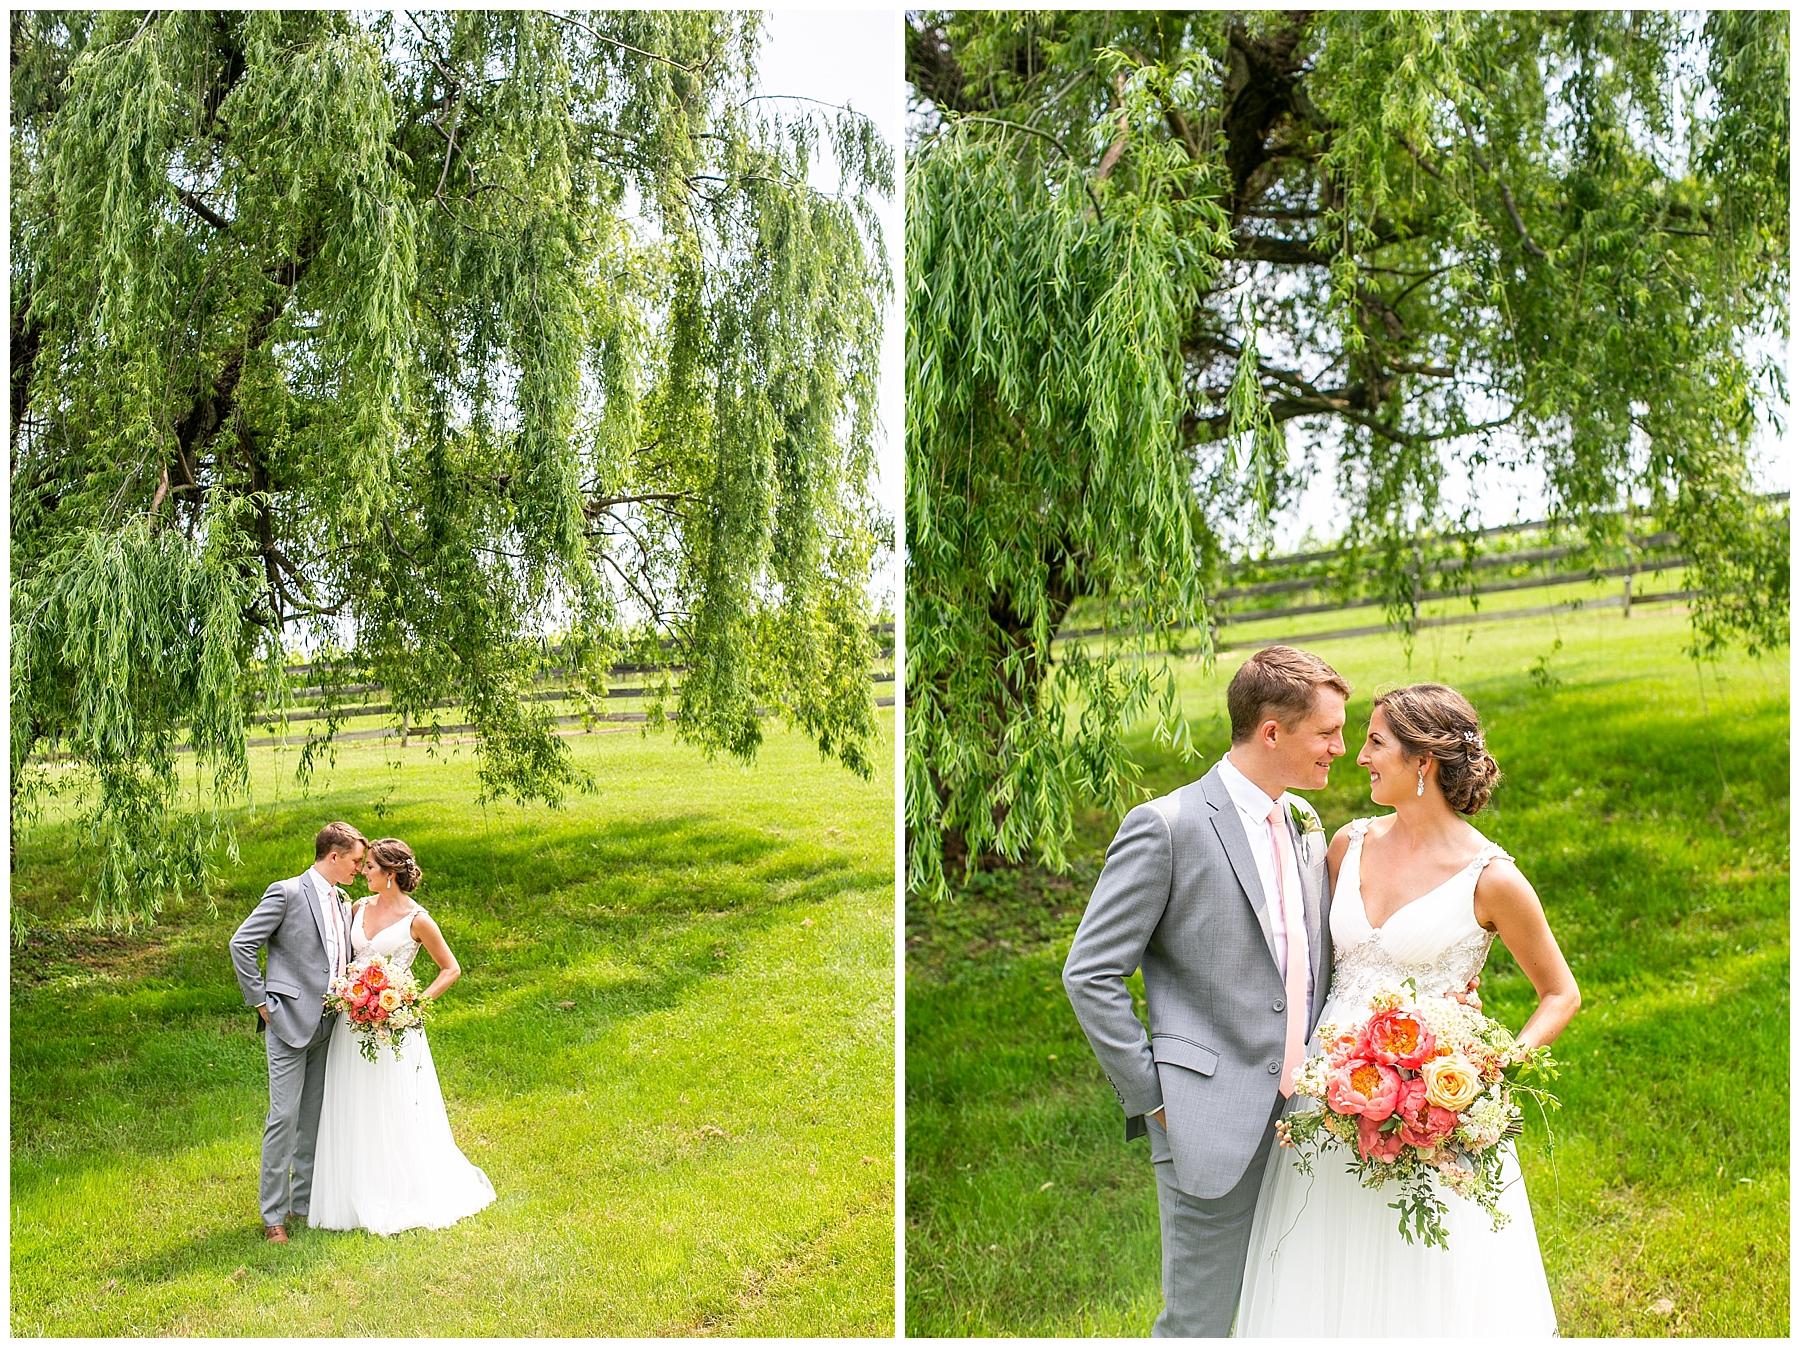 Chelsea Phil Bohemia River Overlook Wedding Living Radiant Photography photos_0054.jpg